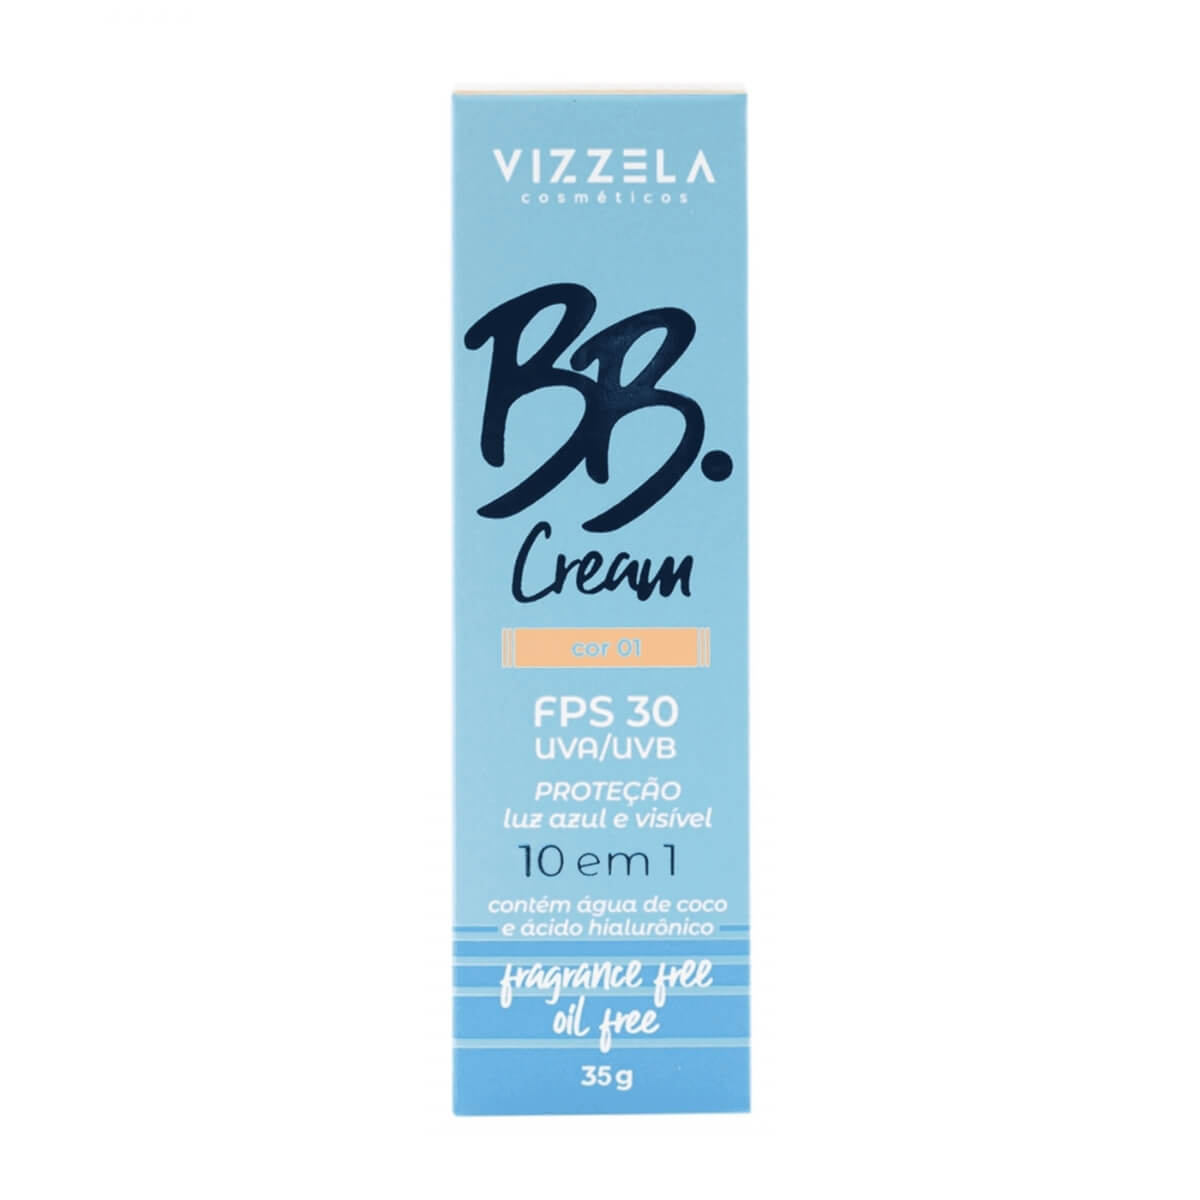 BB Cream FPS30 - Vizzela